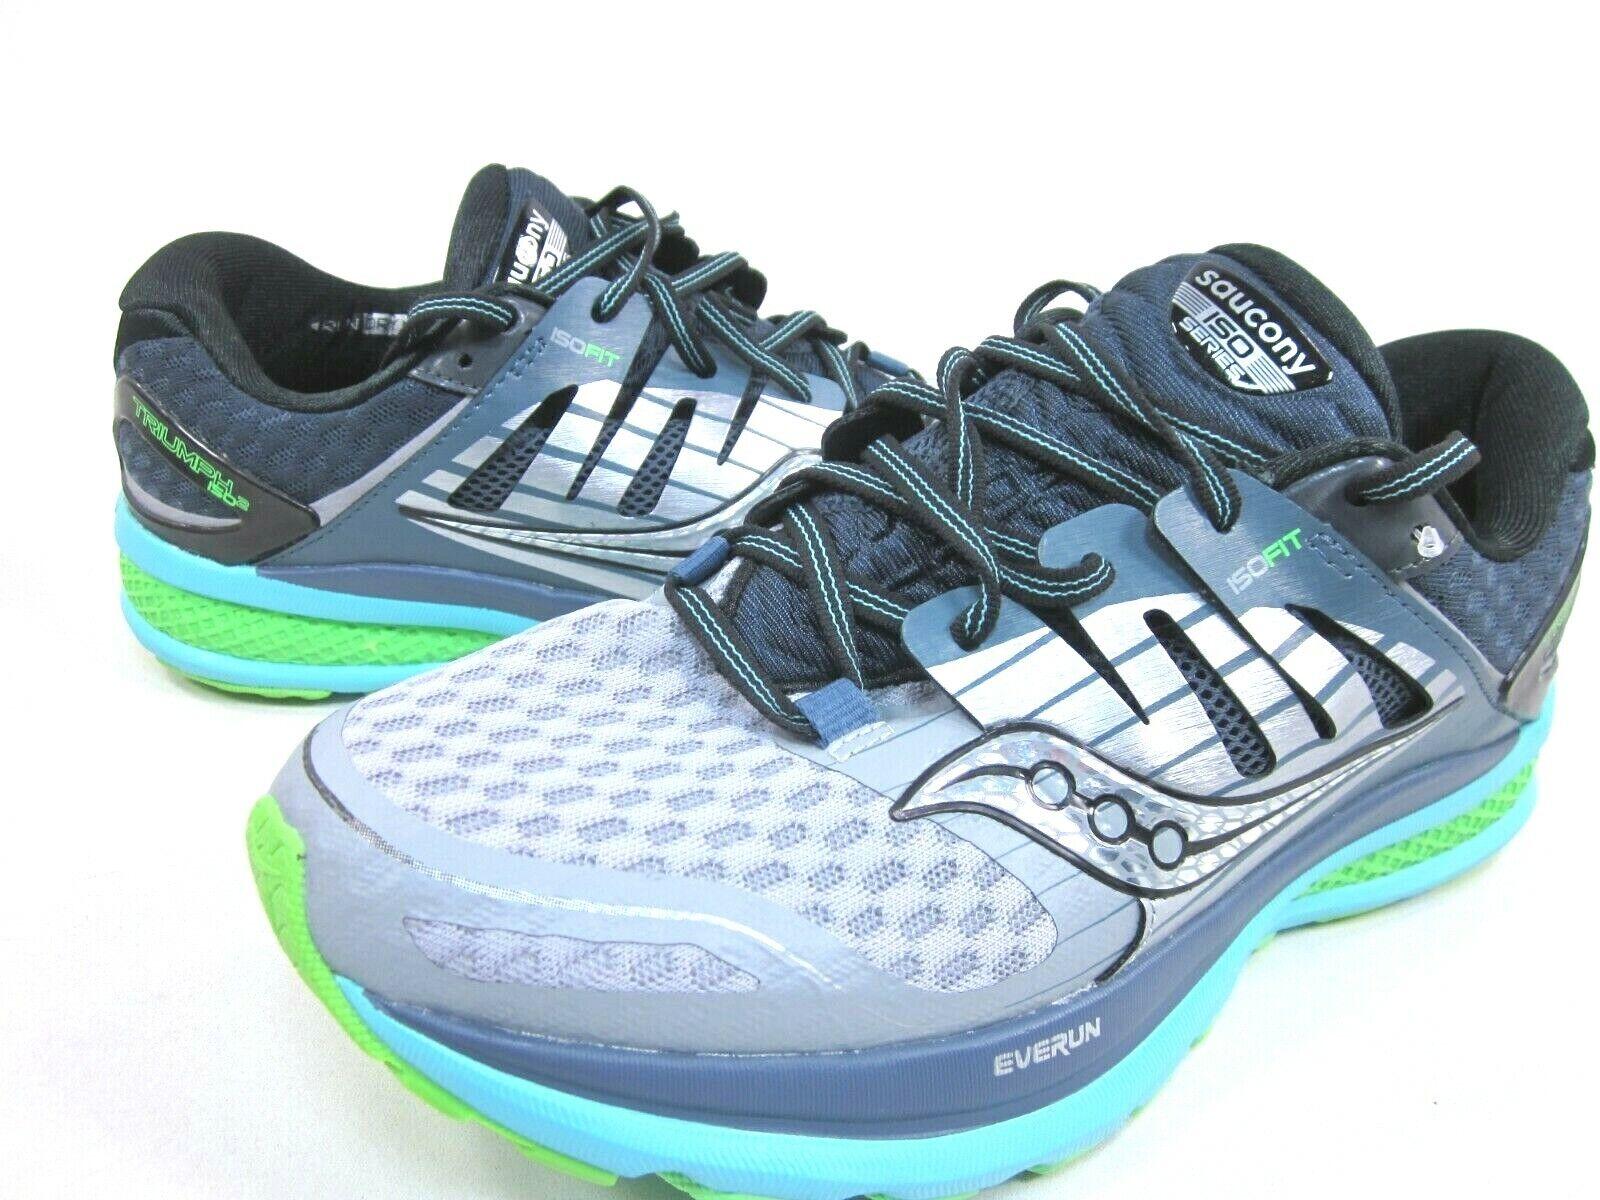 SAUCONY donna TRIUMPH ISO ISO ISO 2 RUNNING scarpe,S10291-1, grigio blu SLIME,WIDE WIDTH 4fd60b